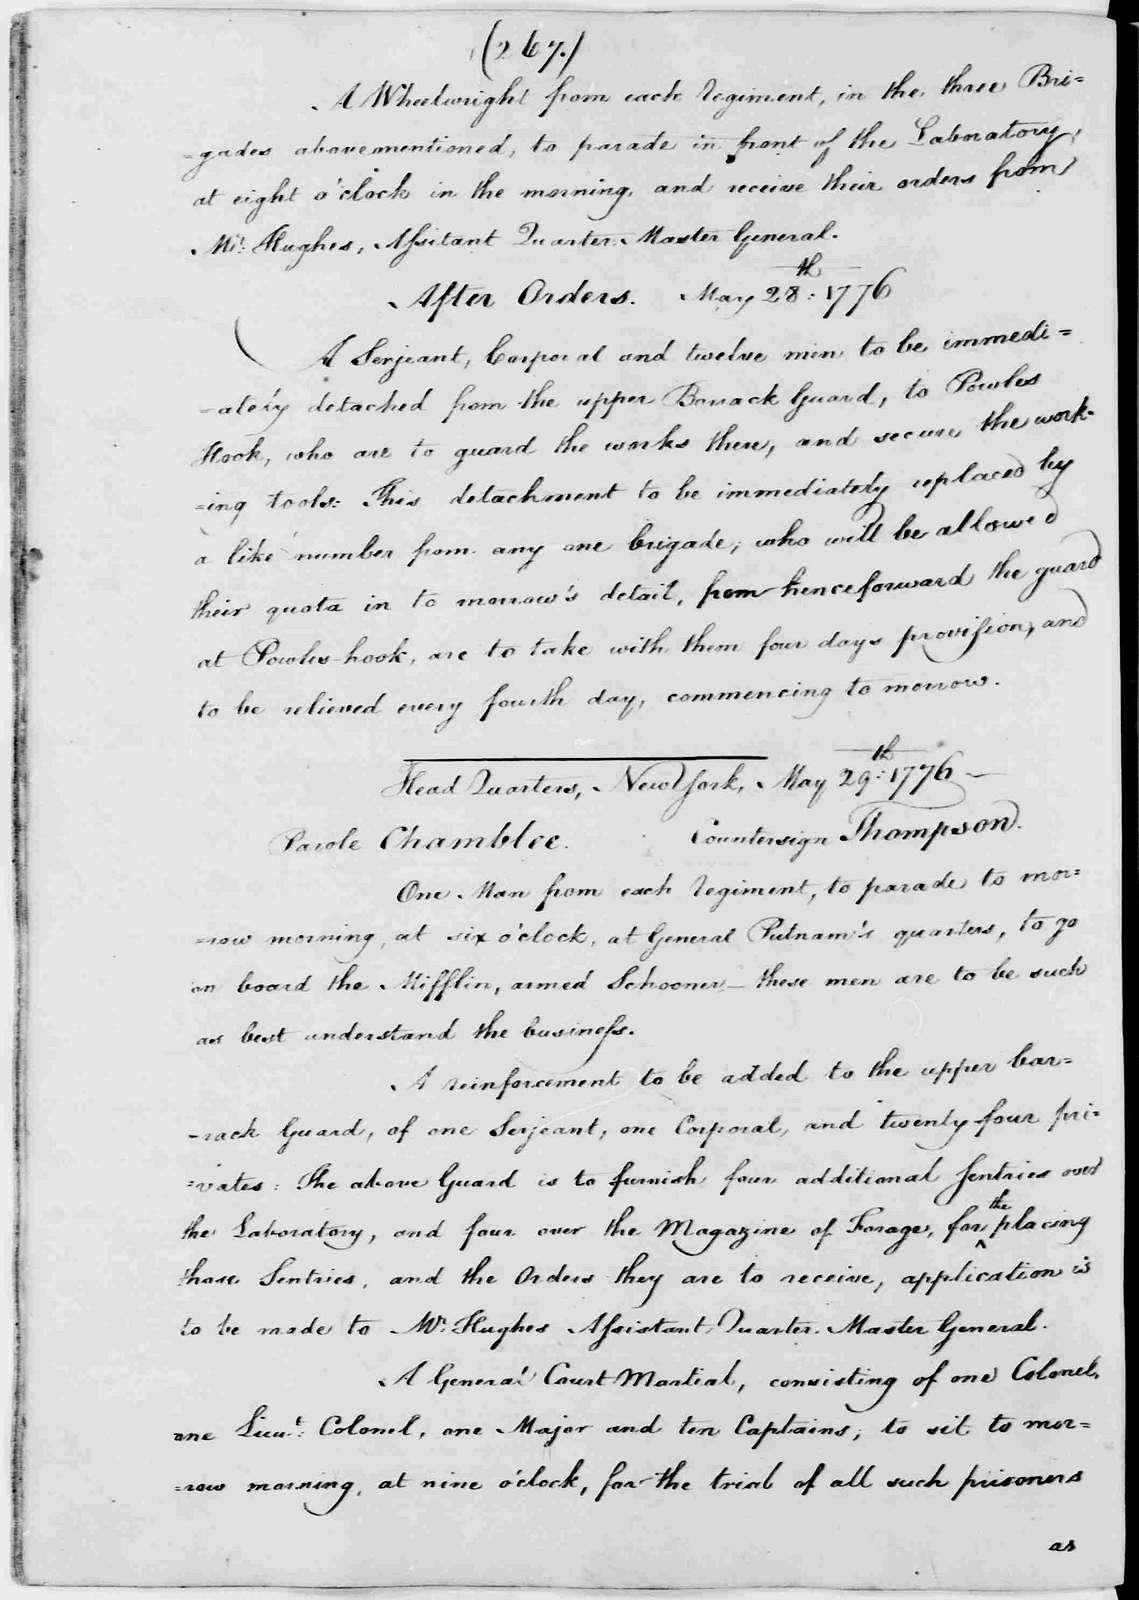 George Washington Papers, Series 3, Varick Transcripts, 1775-1785, Subseries 3G, General Orders, 1775-1783, Letterbook 1: July 3, 1775 - Sept. 30, 1776